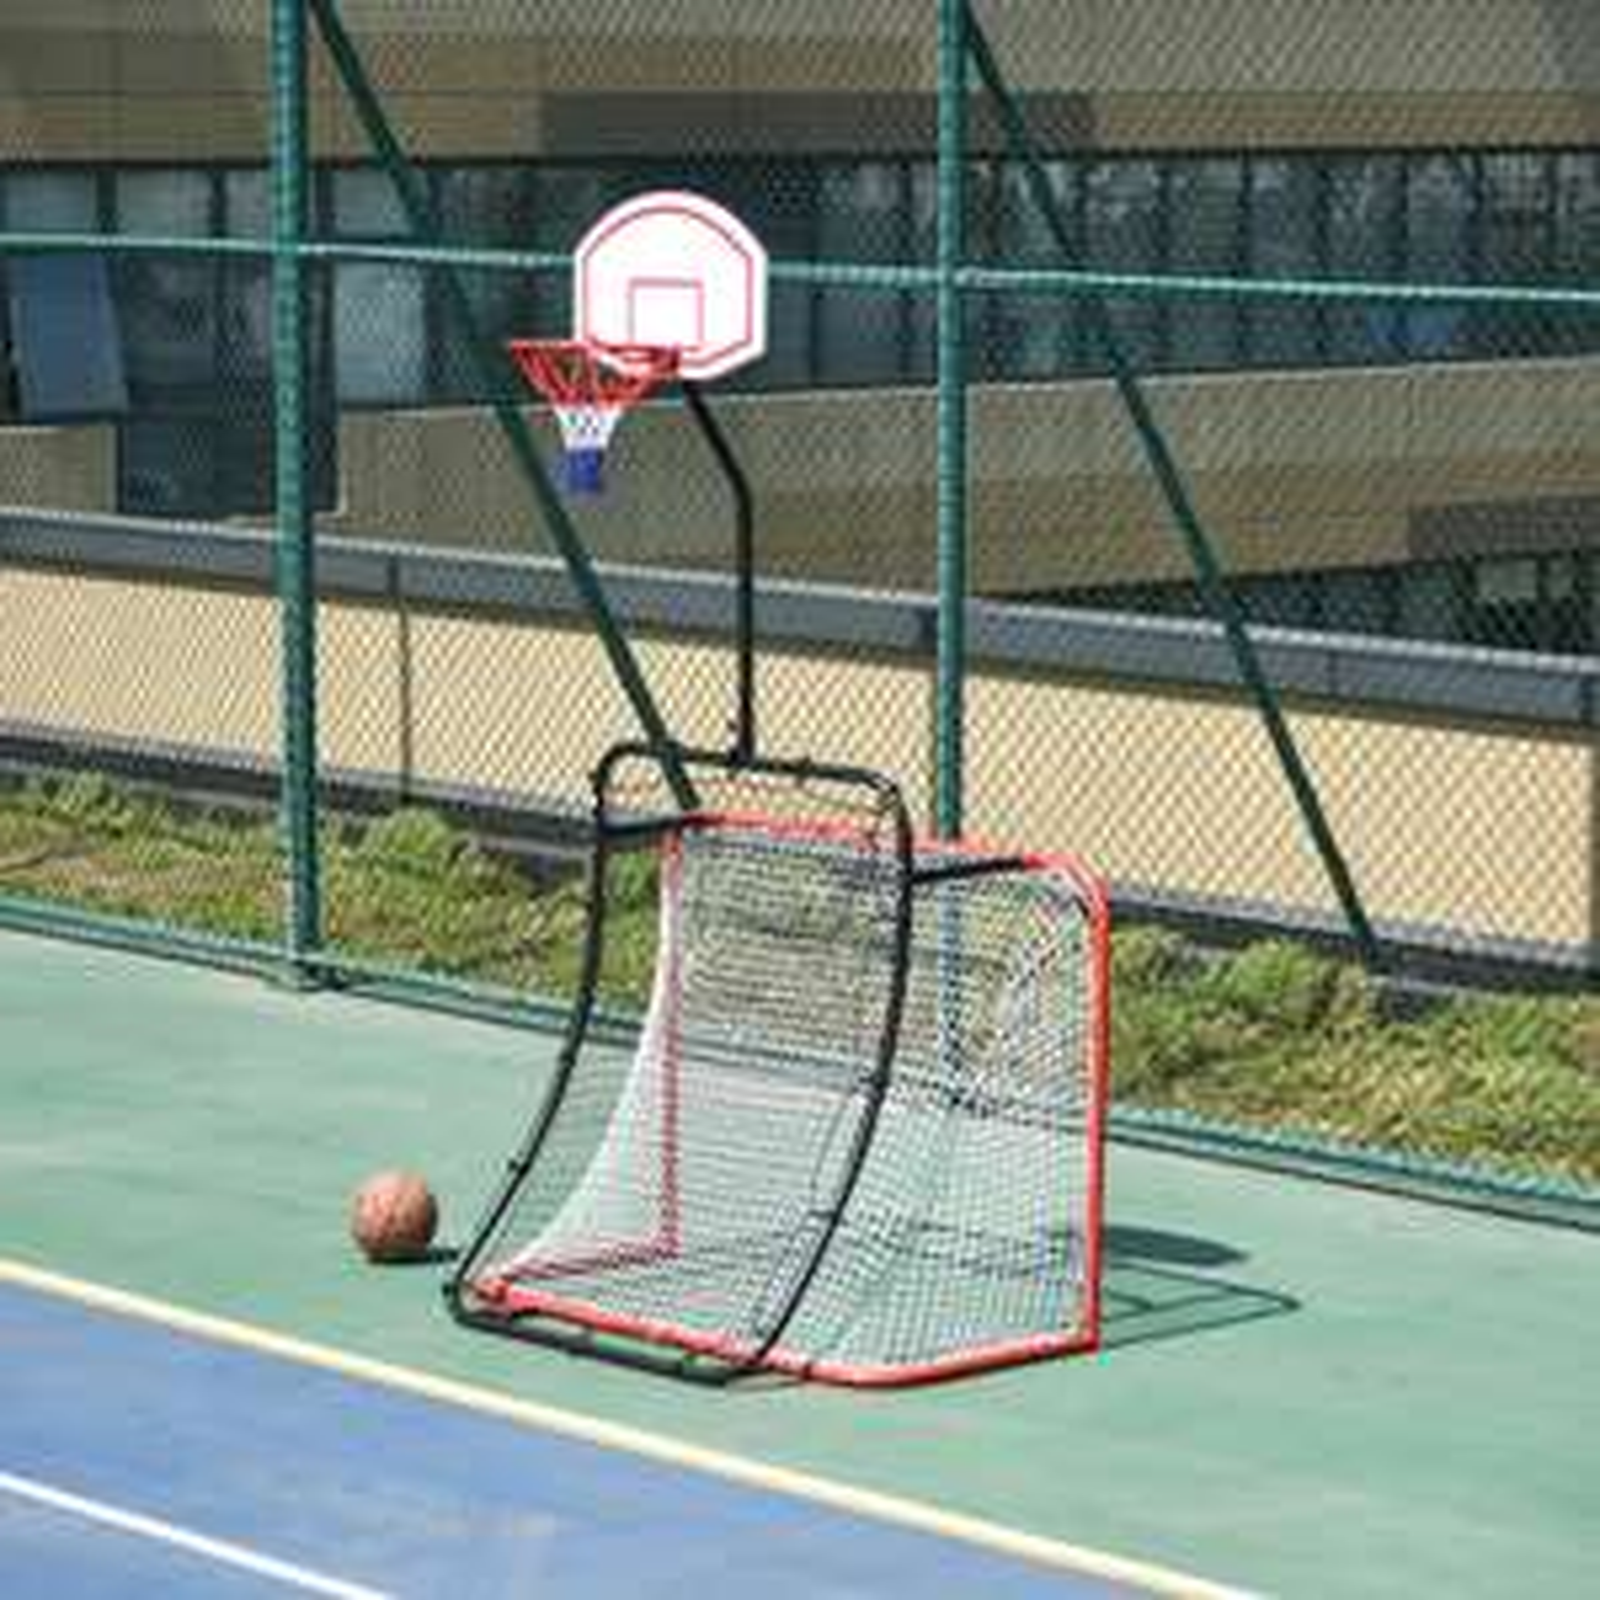 HOMCOM 5.5ft x 9ft 3-In-1 Football Goal Basketball Net Rebounder For Home Play £66.39 delivered @ eBay / outsunny